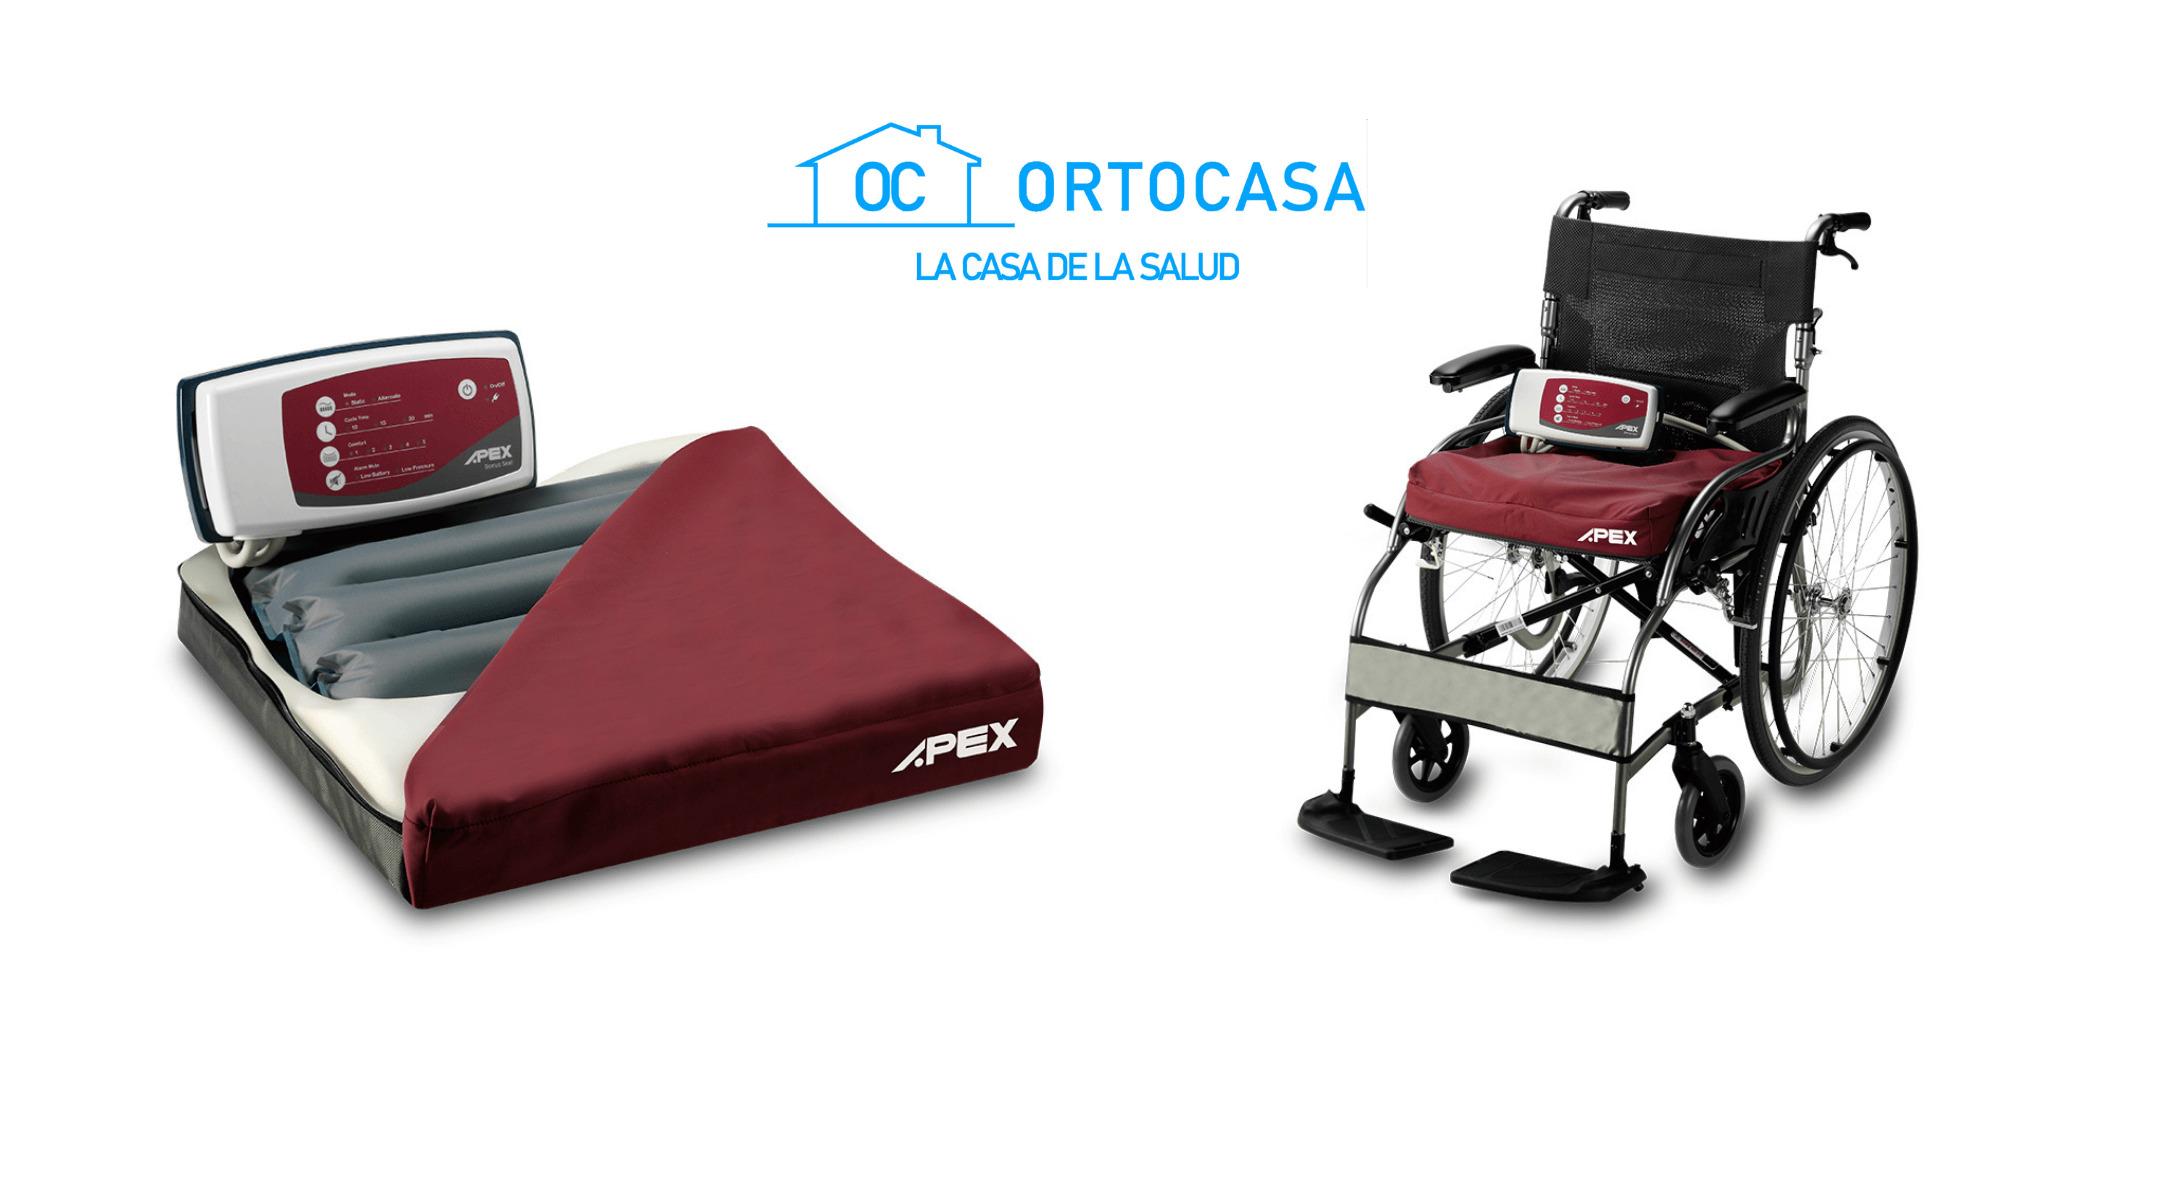 COJIN ANTIESCARAS - ORTOCASA